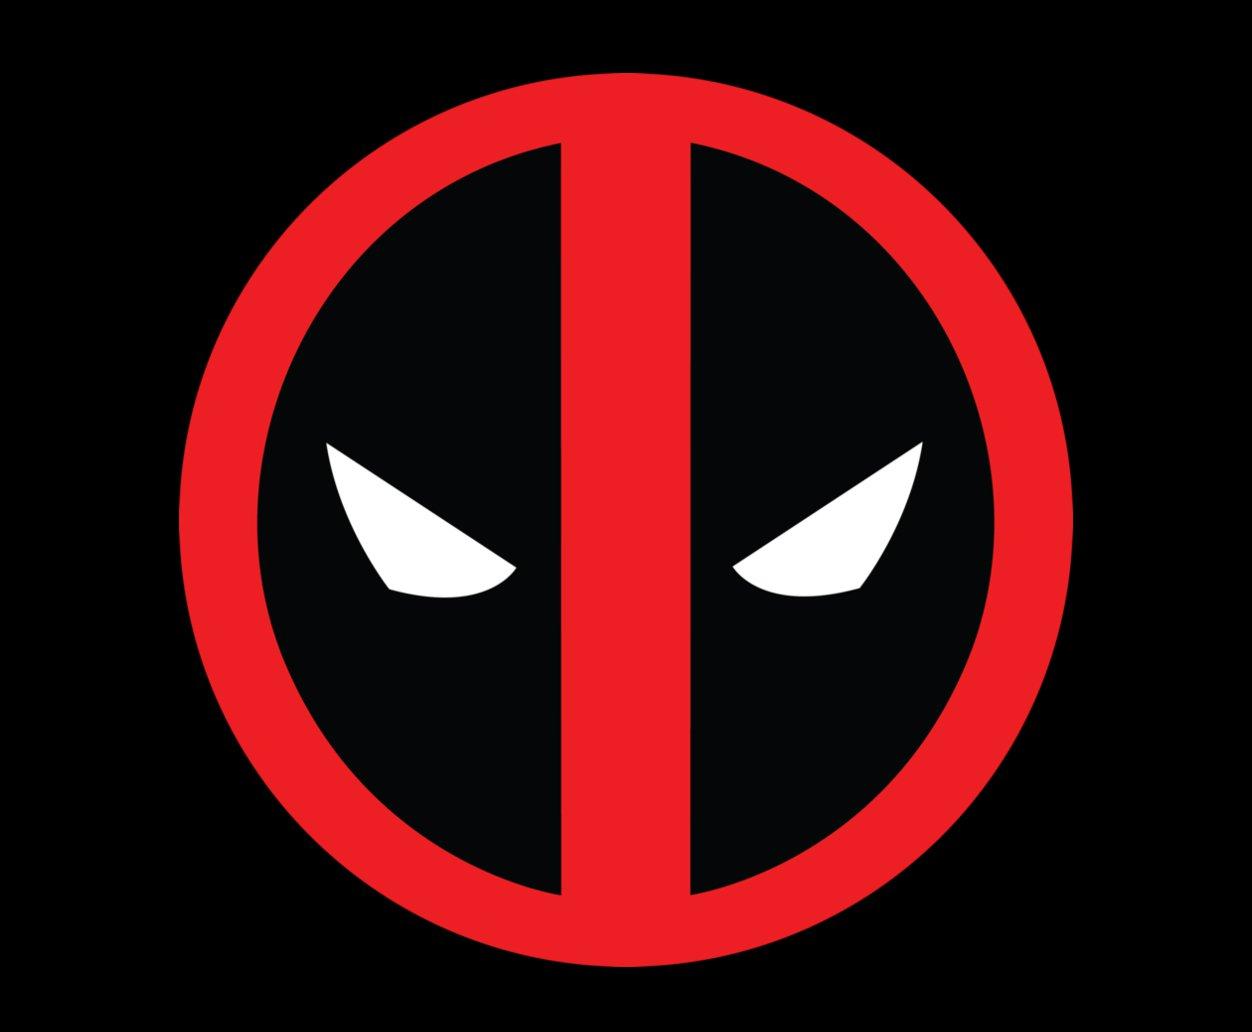 deadpool logo - photo #14